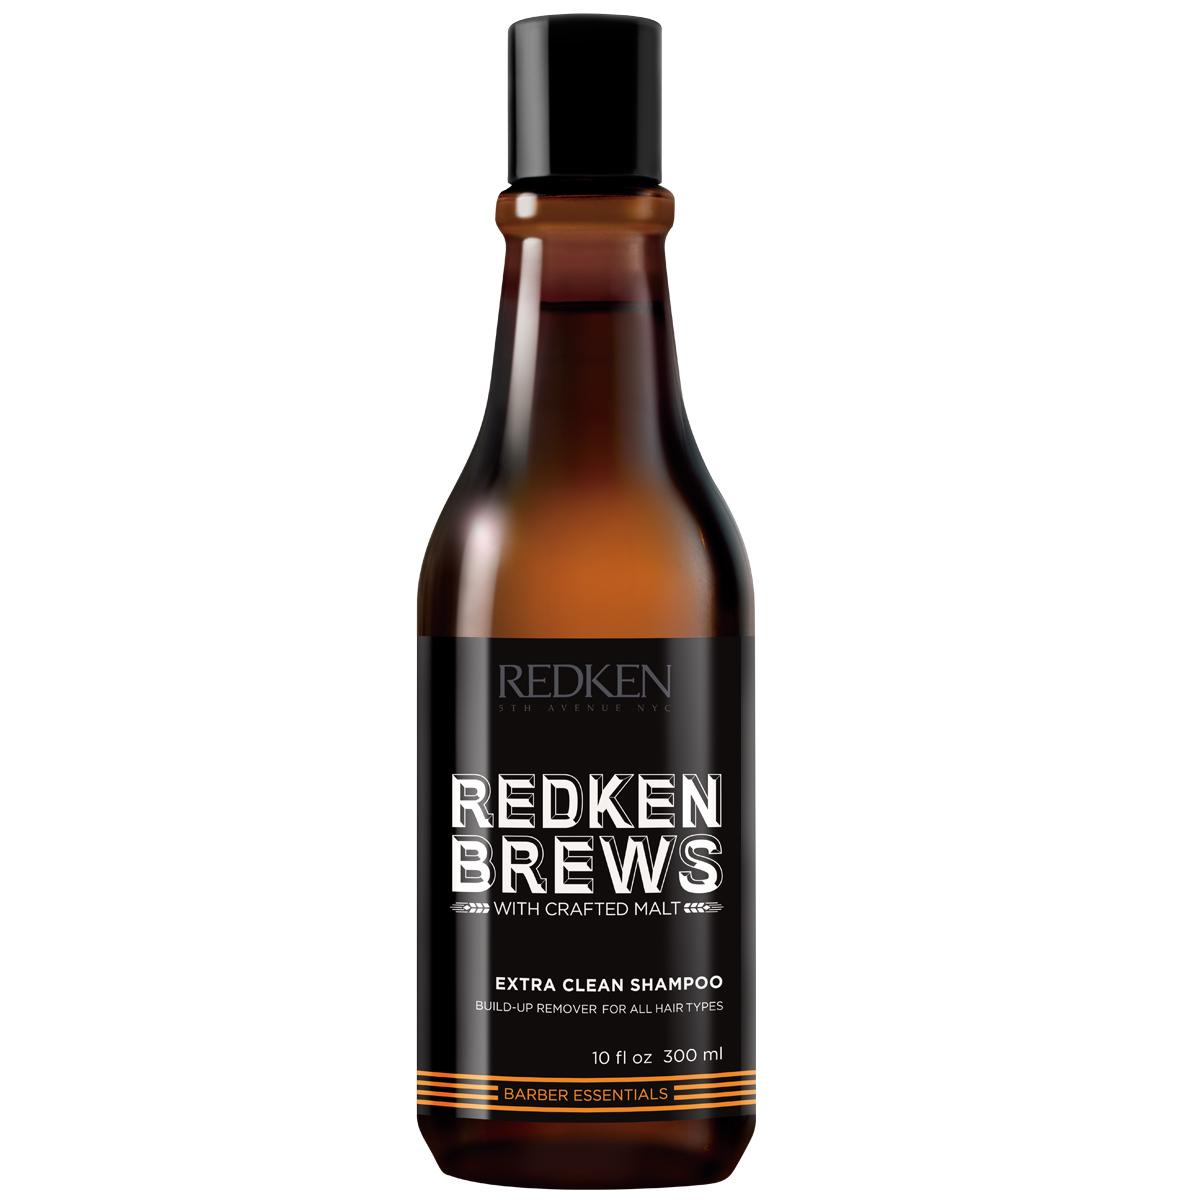 Extra Clean Shampoo de Redken Brews.